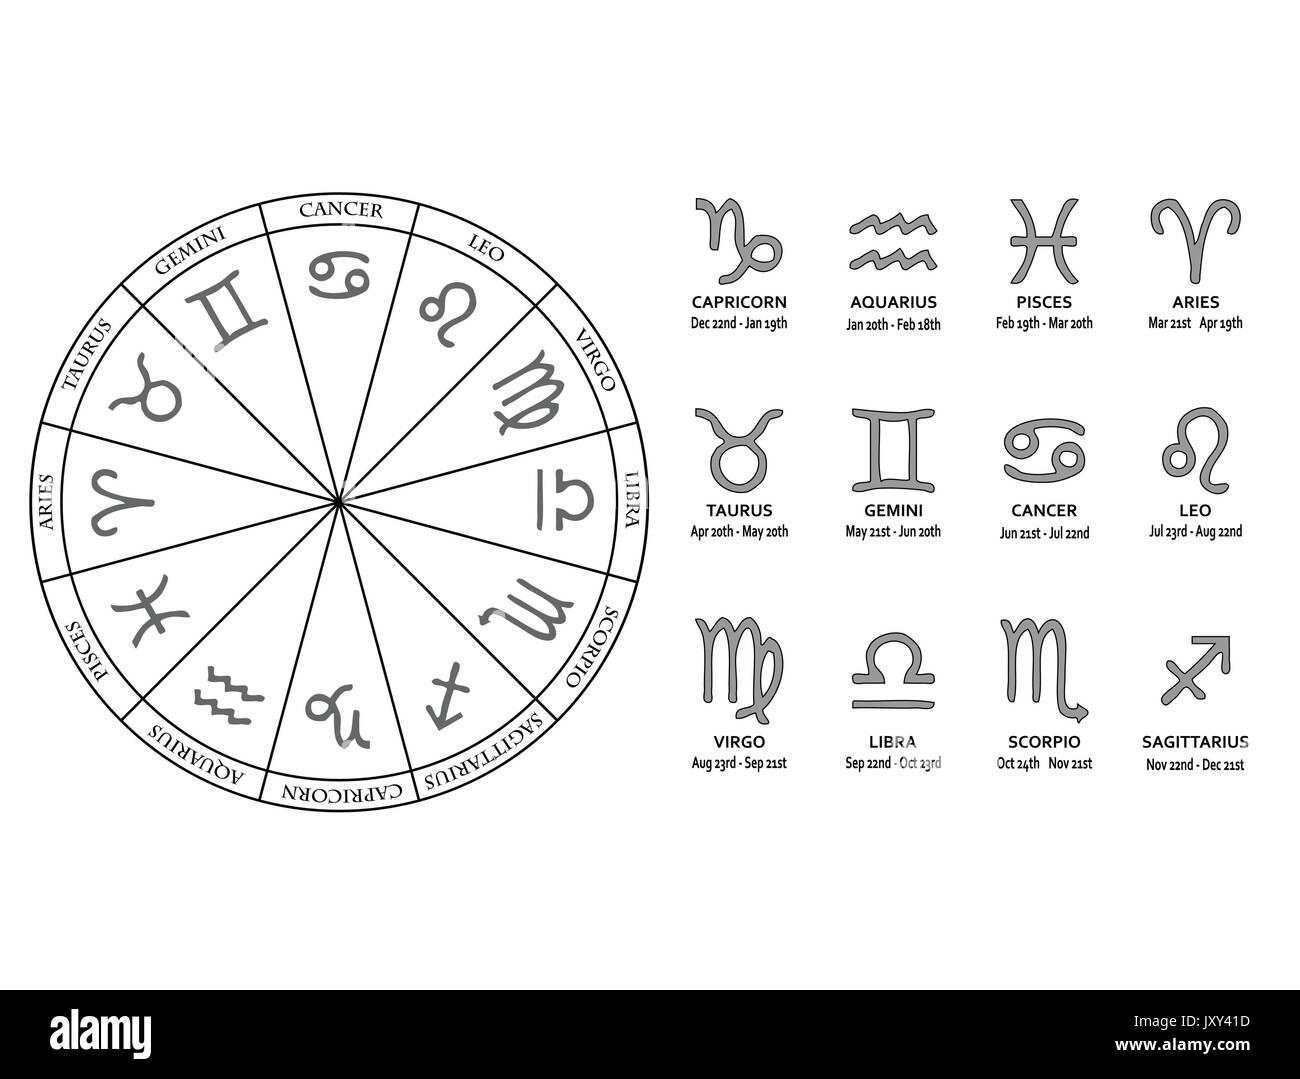 Zodiac Horoscope Star Sign Symbols And Dates Vector Stock Vector Art